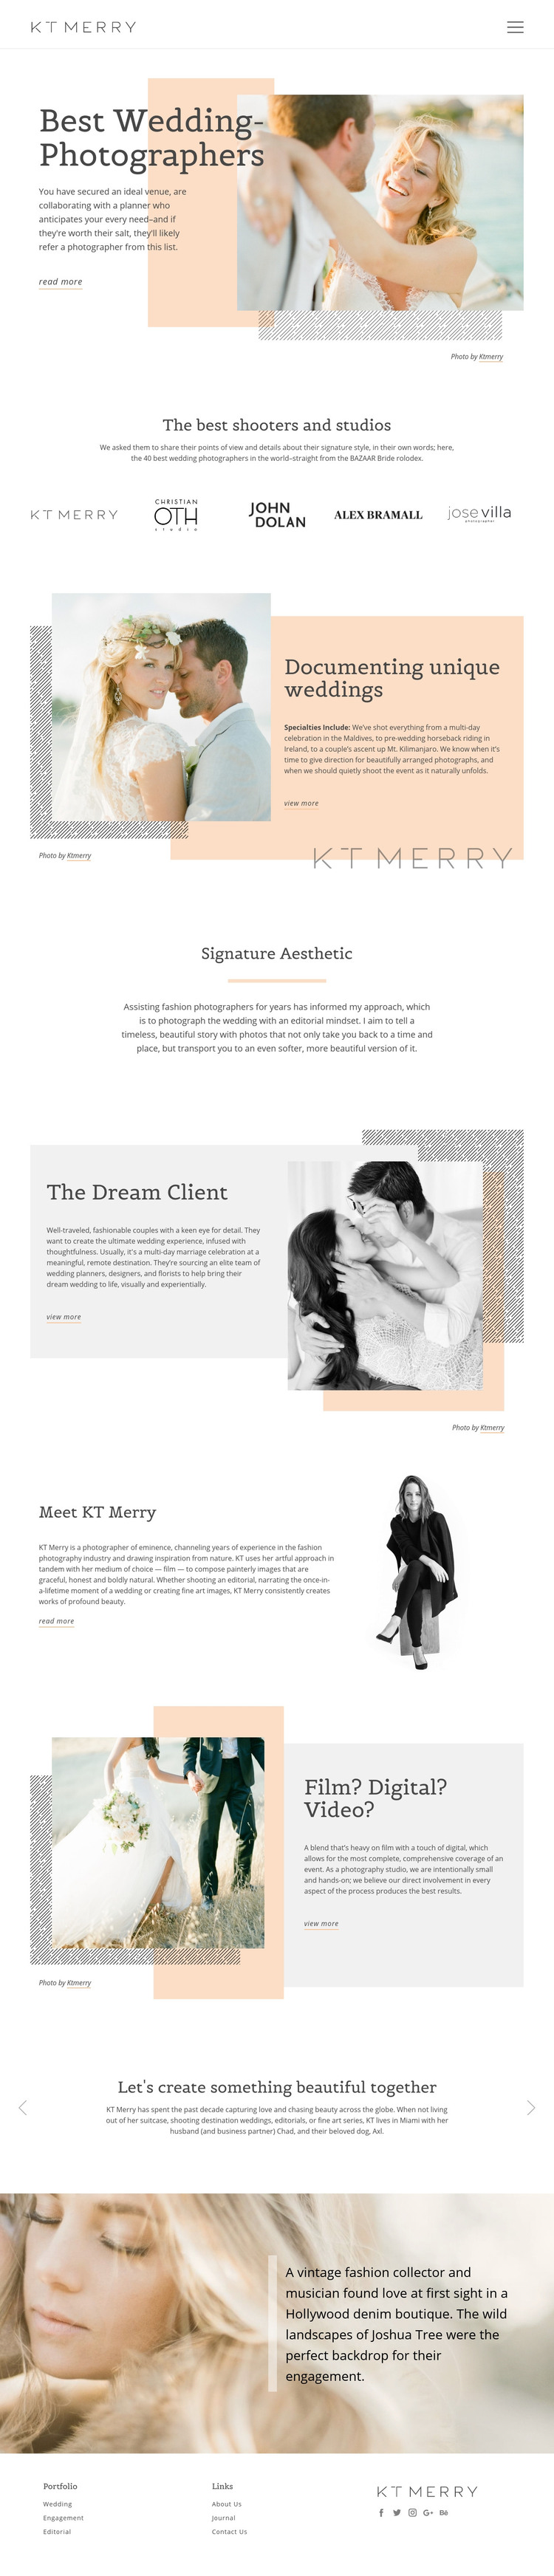 Wedding Photographers Homepage Design